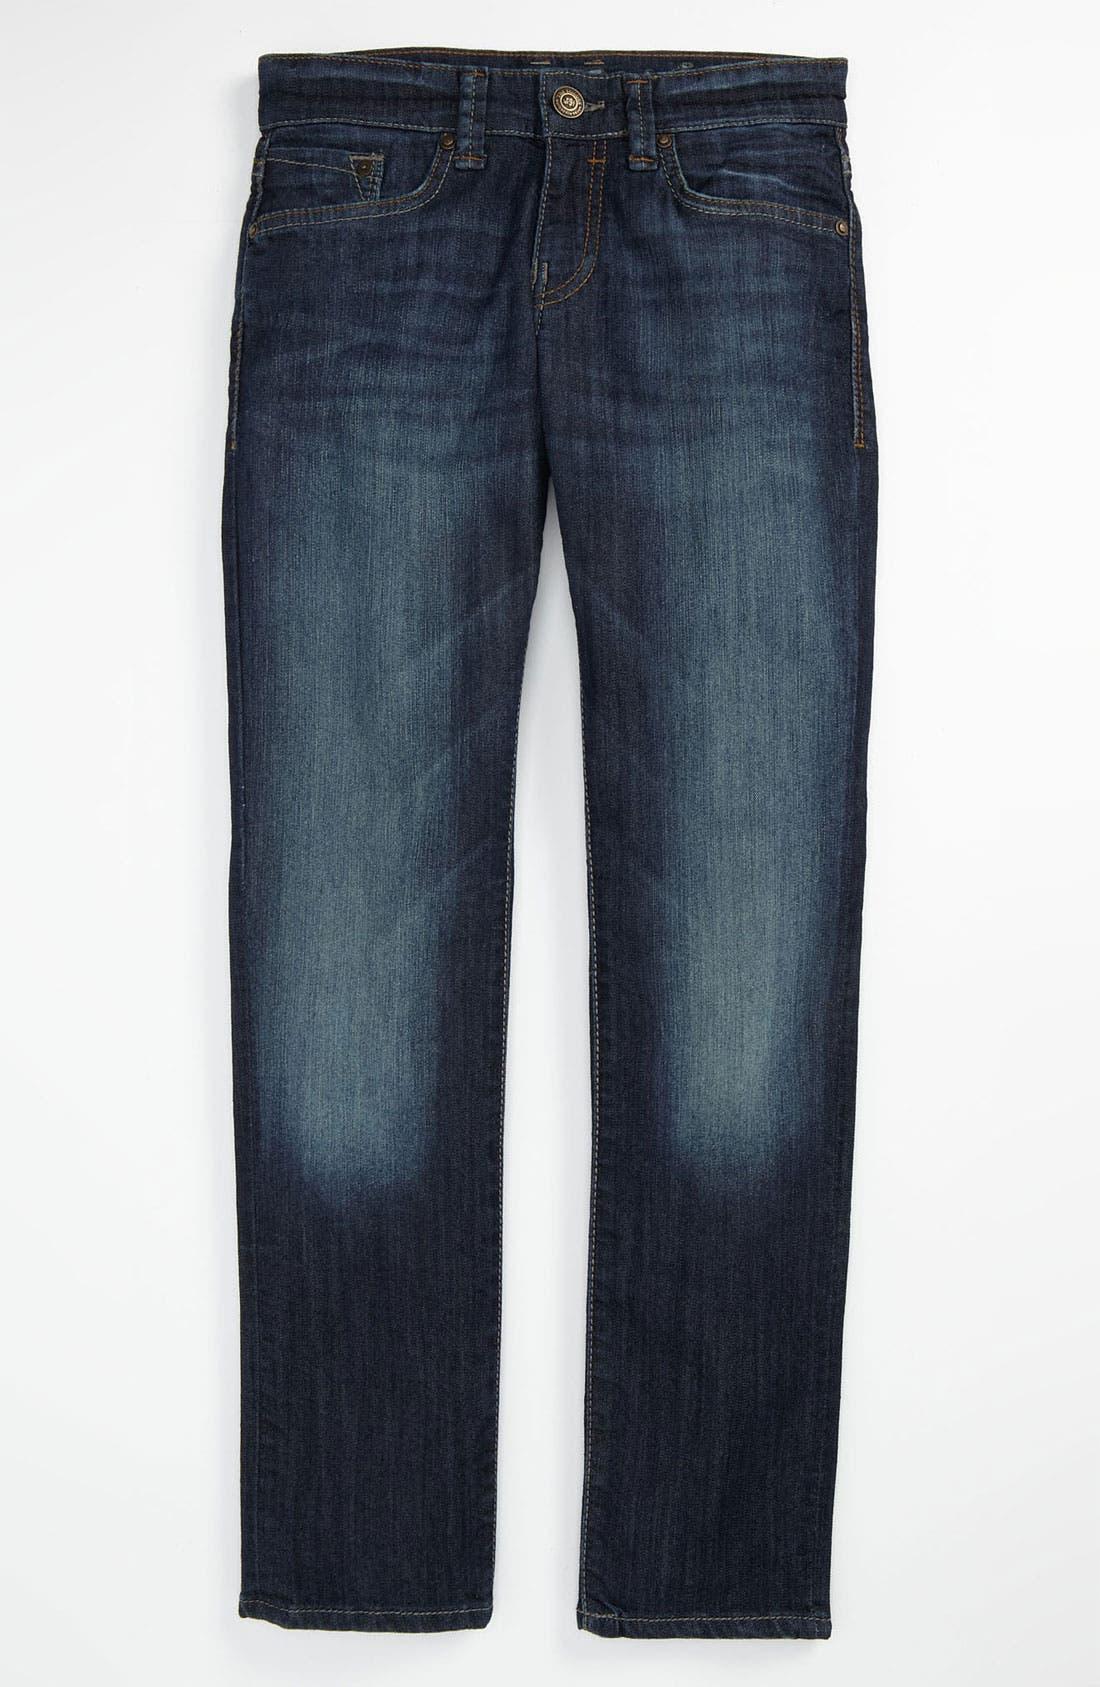 'Justin' Jeans,                             Alternate thumbnail 2, color,                             400